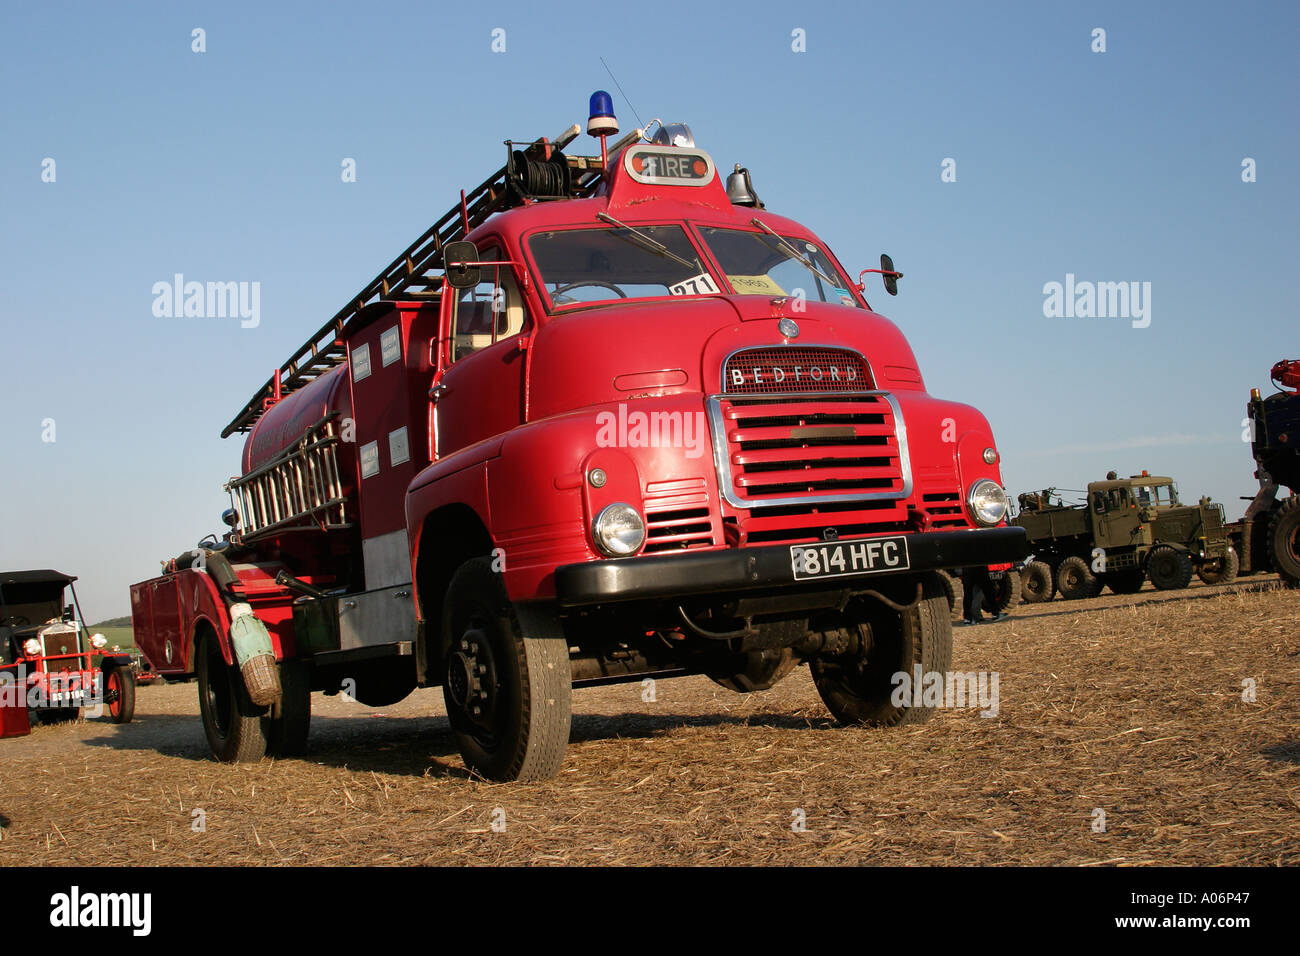 Vintage Bedford fire engine, Great Dorset Steam Fair, England, UK - Stock Image